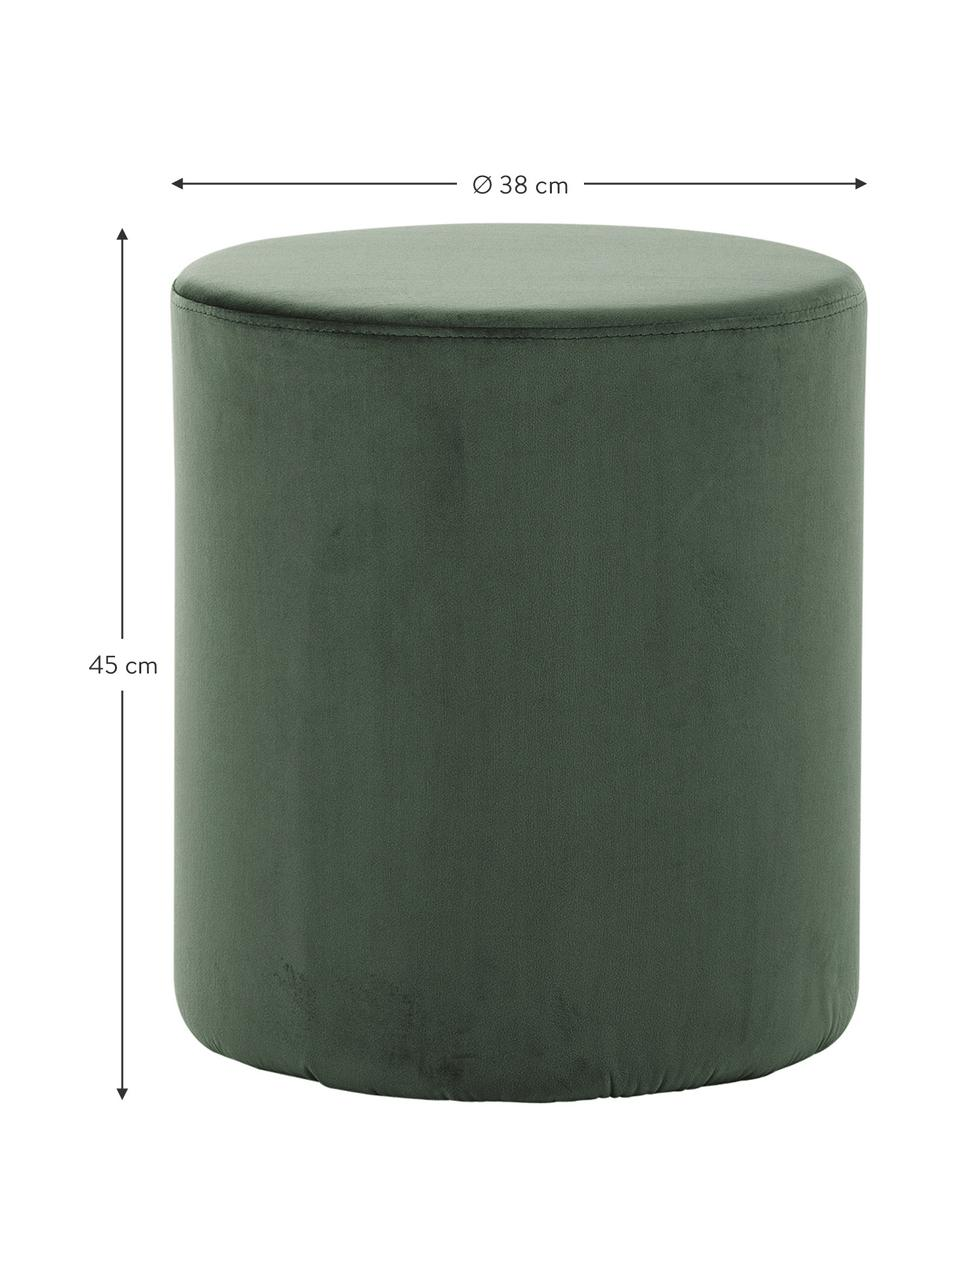 Samt-Hocker Daisy in Grün, Bezug: Samt (Polyester) Der hoch, Rahmen: Sperrholz, Samt Grün, Ø 38 x H 45 cm